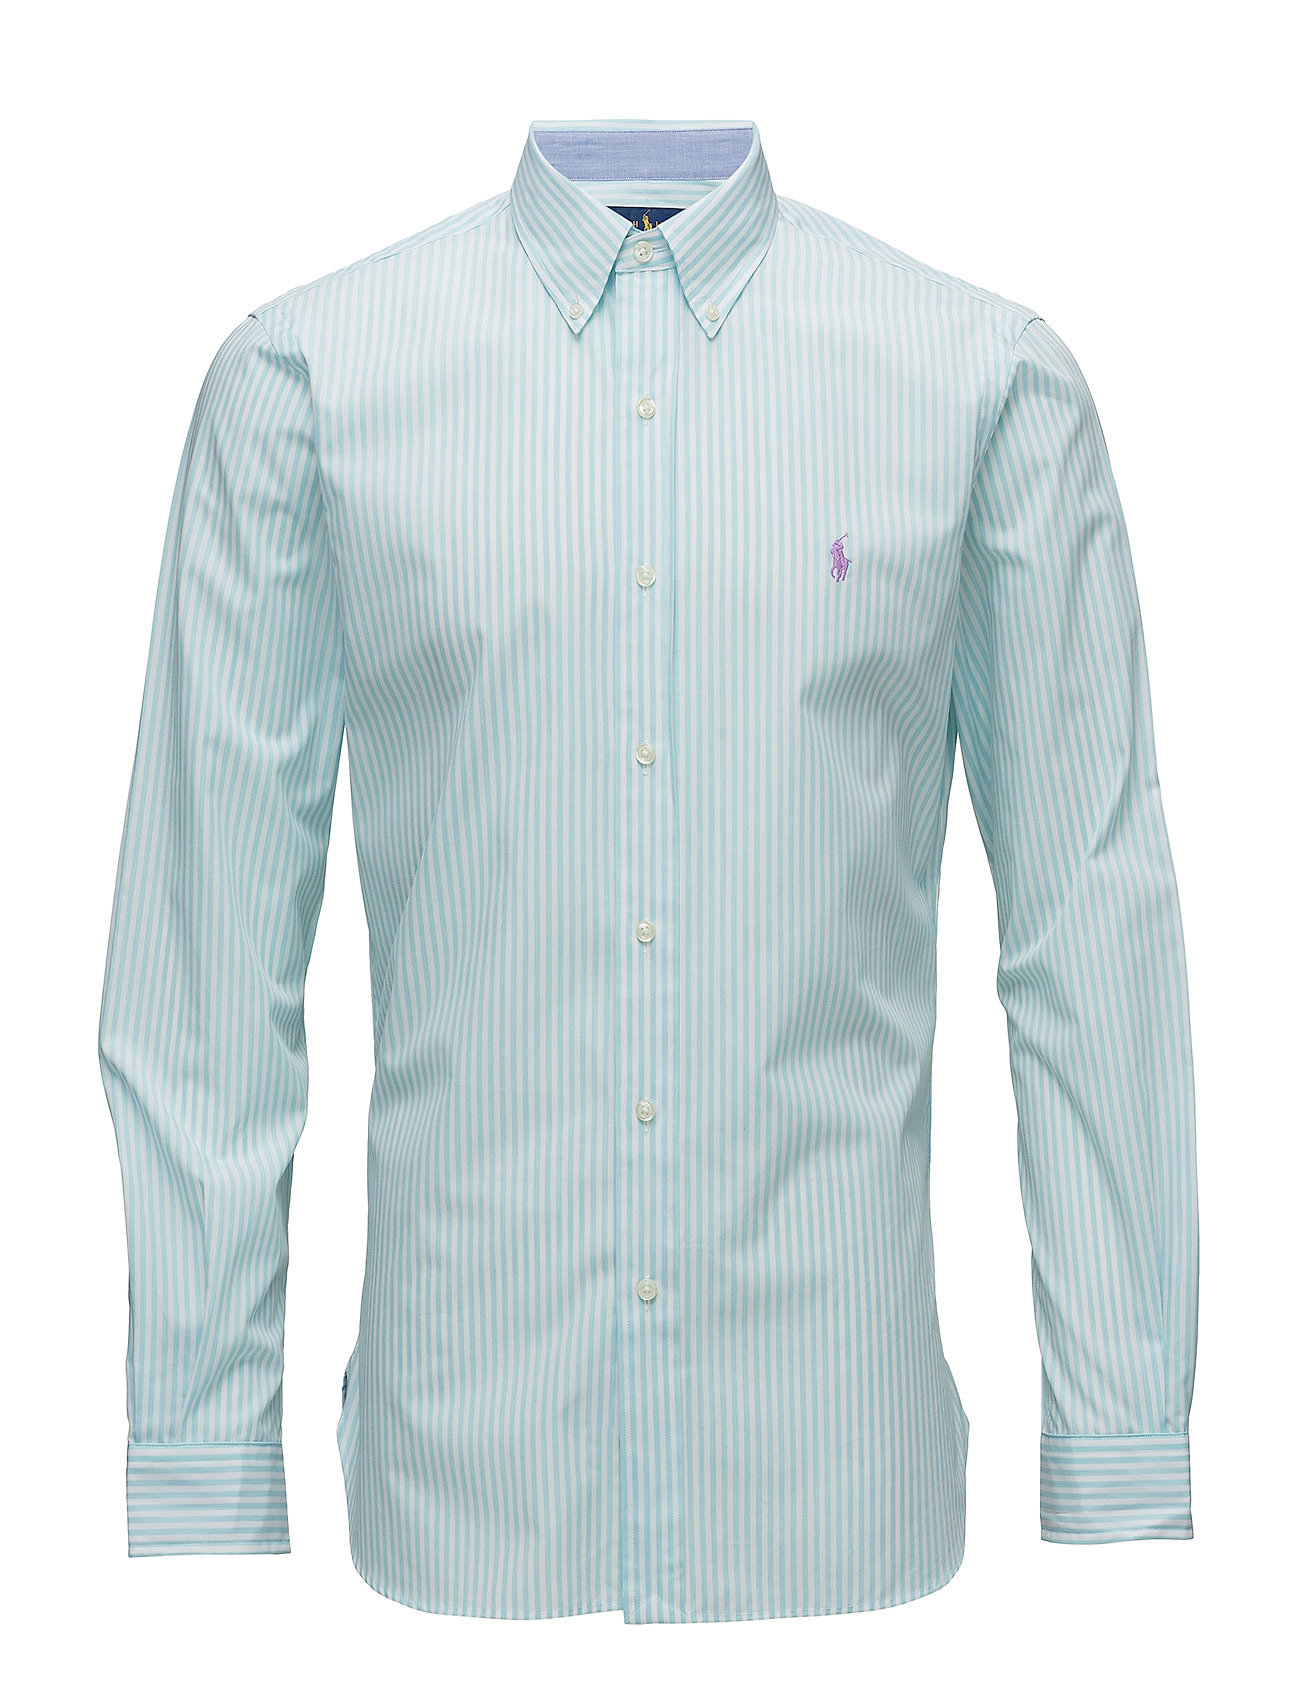 Slim Fit Cotton Shirt (2582a Light Turqu) (70.85 €) - Polo Ralph ... 8074ea8ef